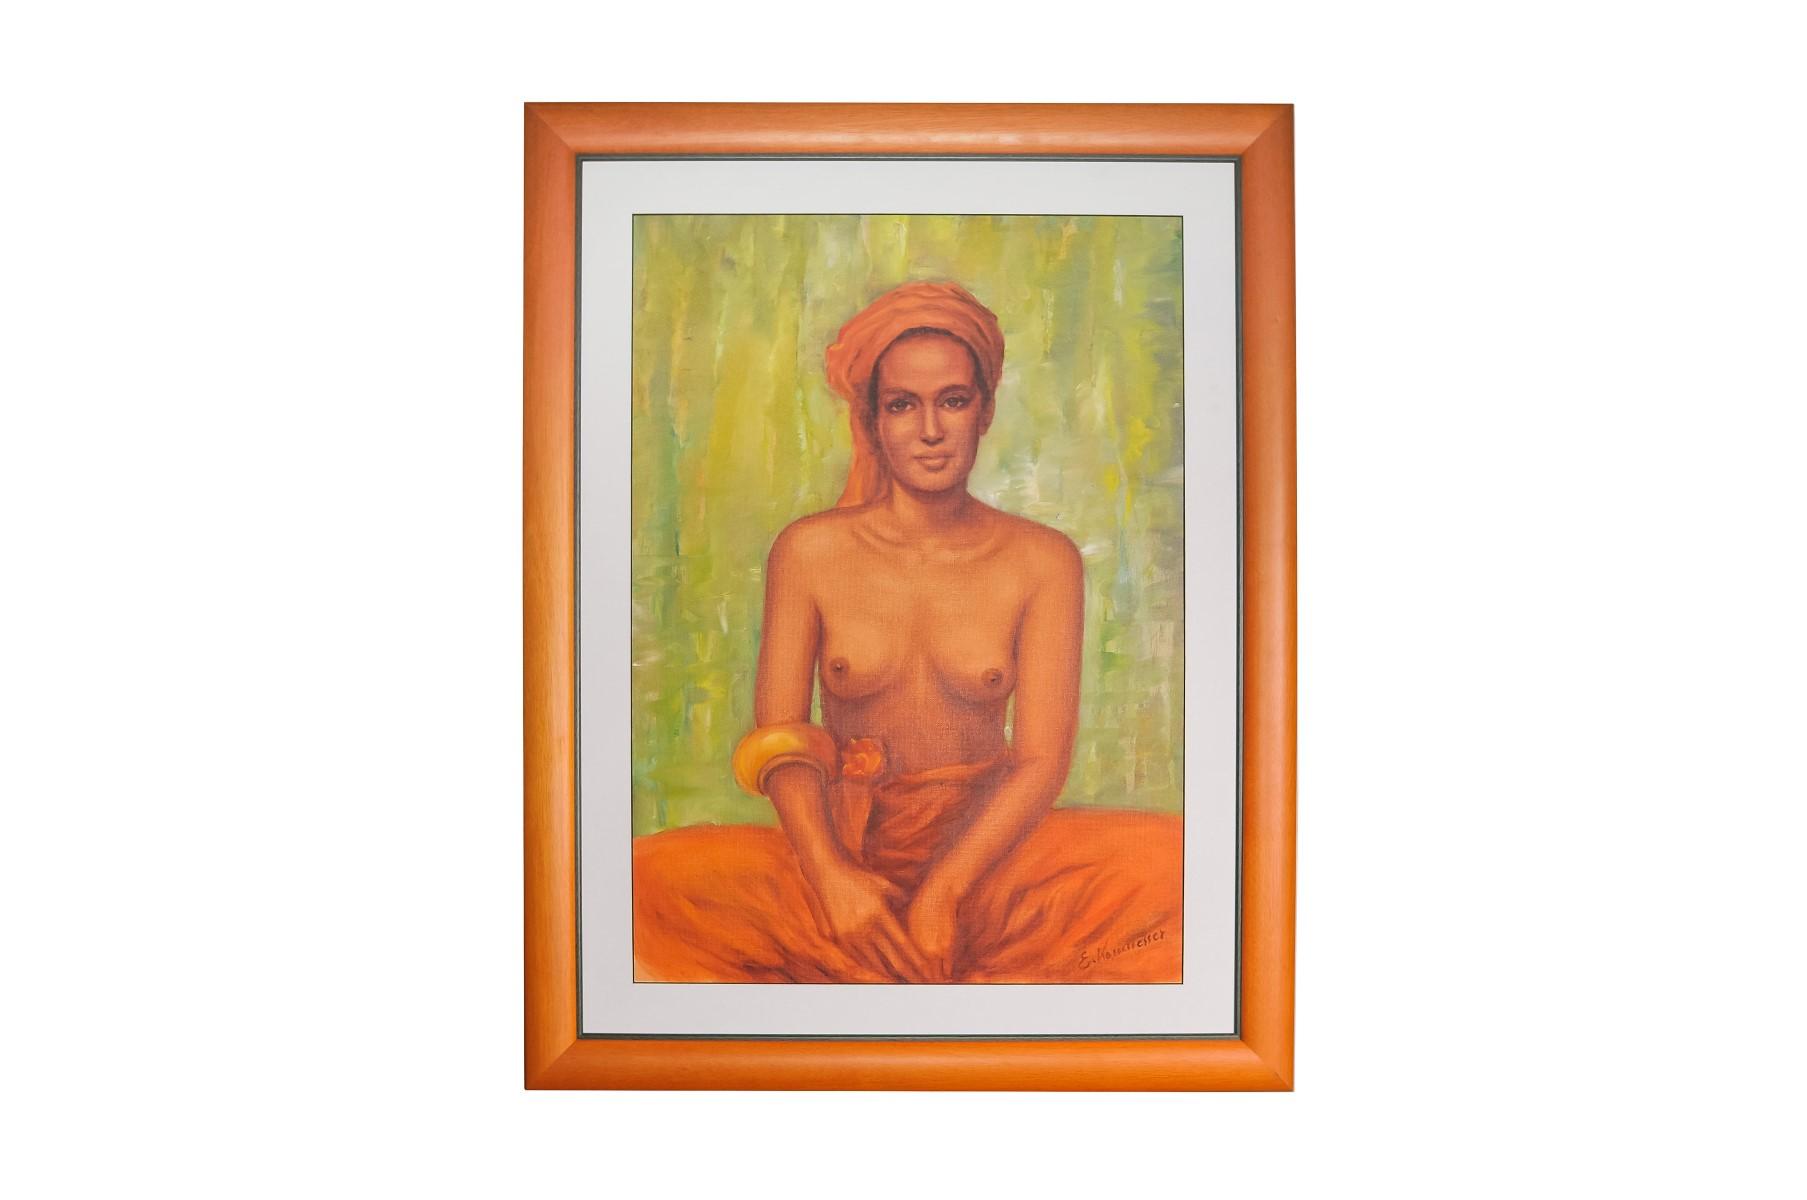 #92 Erika Kornmesser (1934), Bedouin Woman with Naked Bust | Erika Kornmesser (1934), Beduinenfrau mit nacktem Oberkörper Image